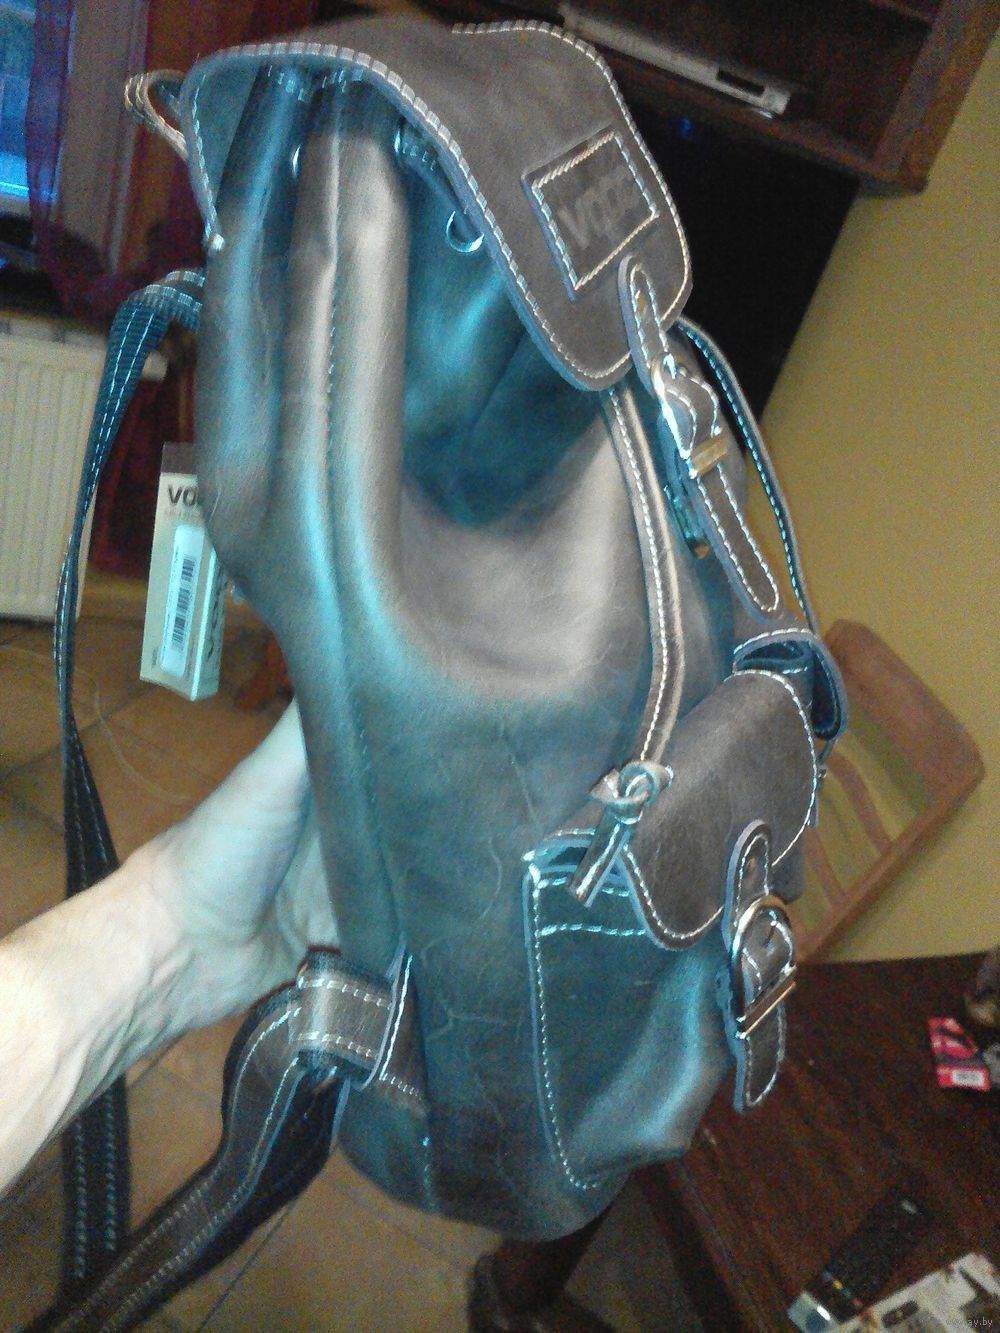 82d0ba09bef15 Plecak w stylu retro ze skóry naturalnej VOOC TC13 brąz. Skórzany plecak  VOOC w niepowtarzalnym stylu retro. Wykonany z naturalnej skóry Crazy Horse.